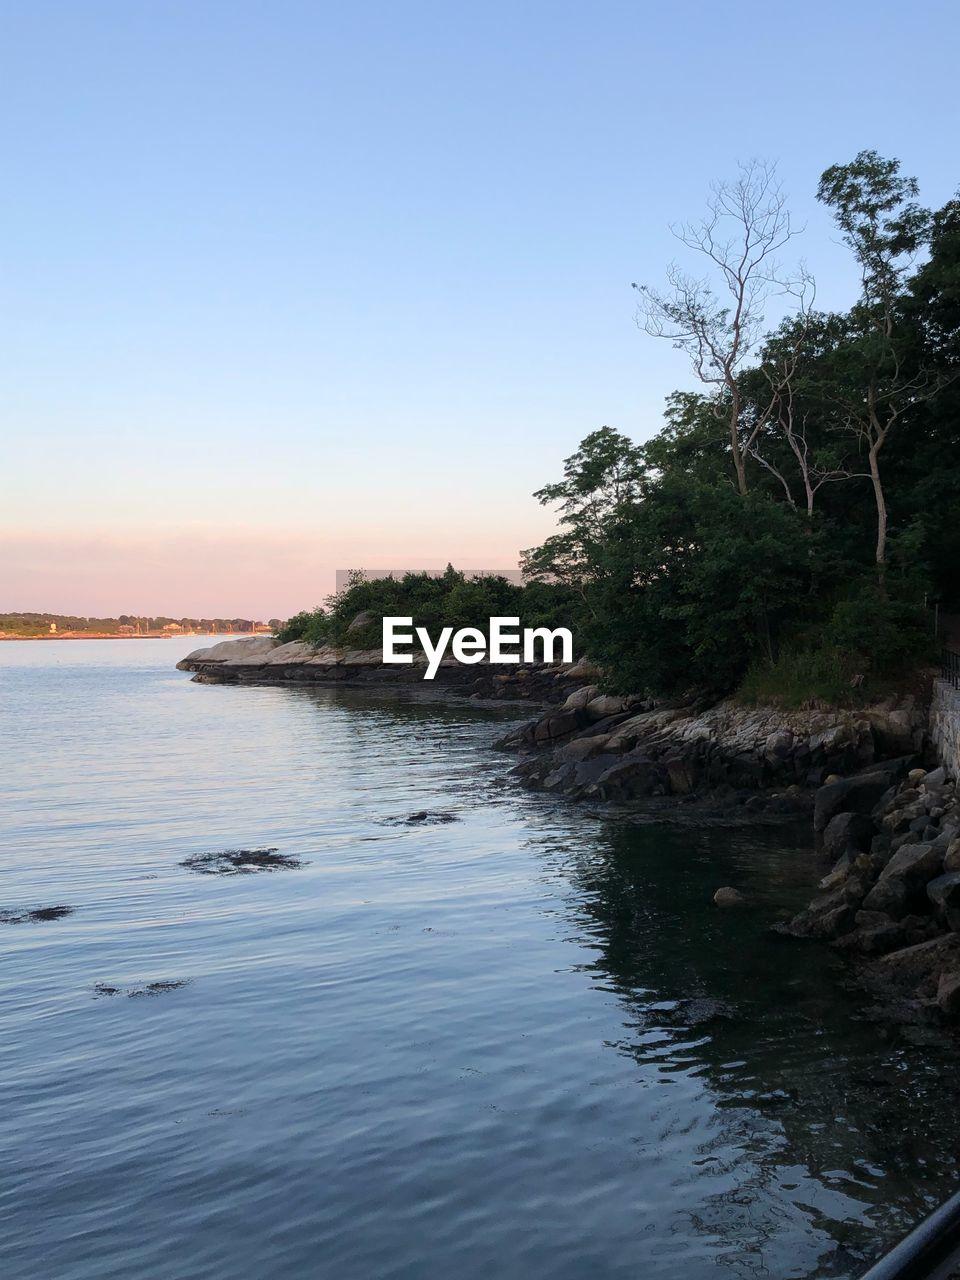 water, sky, tree, tranquility, scenics - nature, beauty in nature, clear sky, plant, tranquil scene, nature, no people, sunset, waterfront, sea, non-urban scene, outdoors, idyllic, reflection